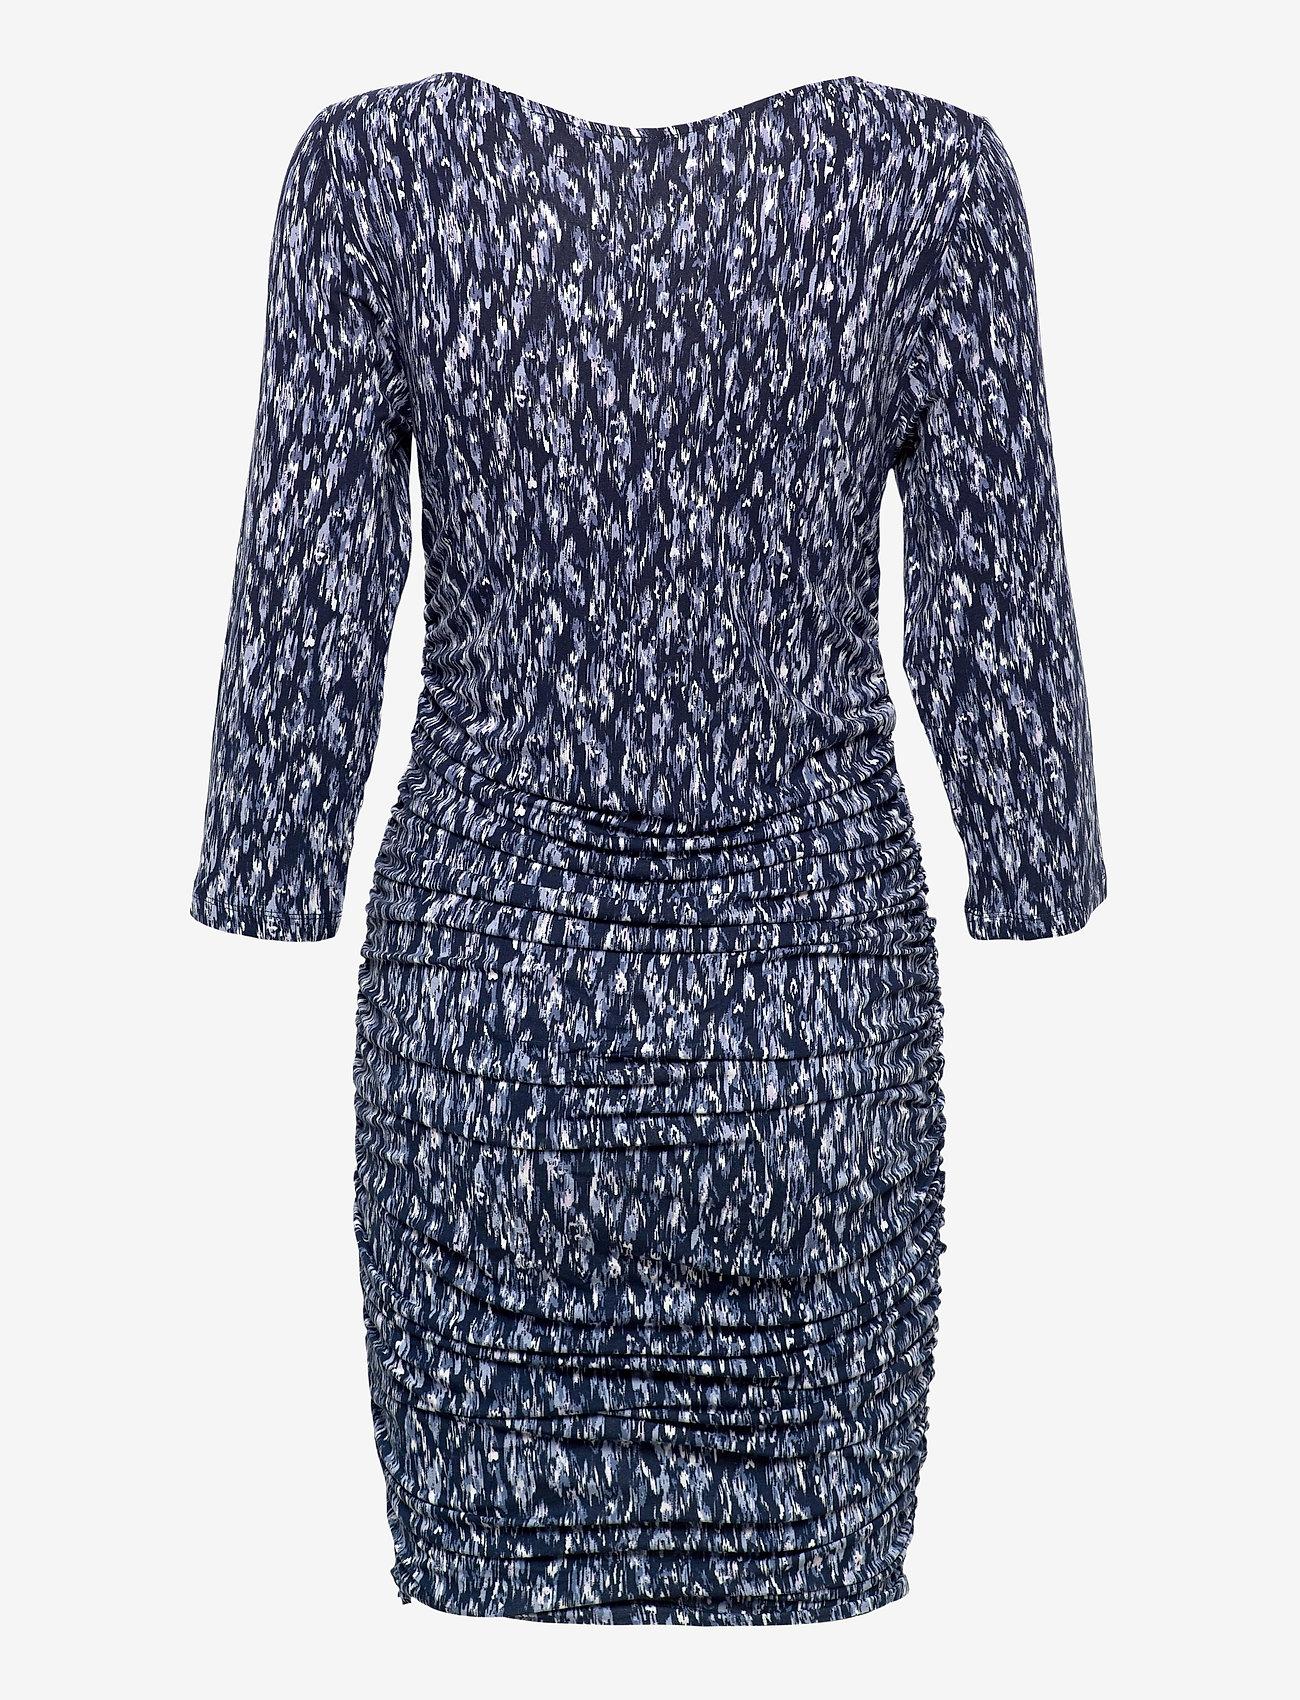 ICHI - IHLISA DR14 - midi dresses - cashmere blue - 1